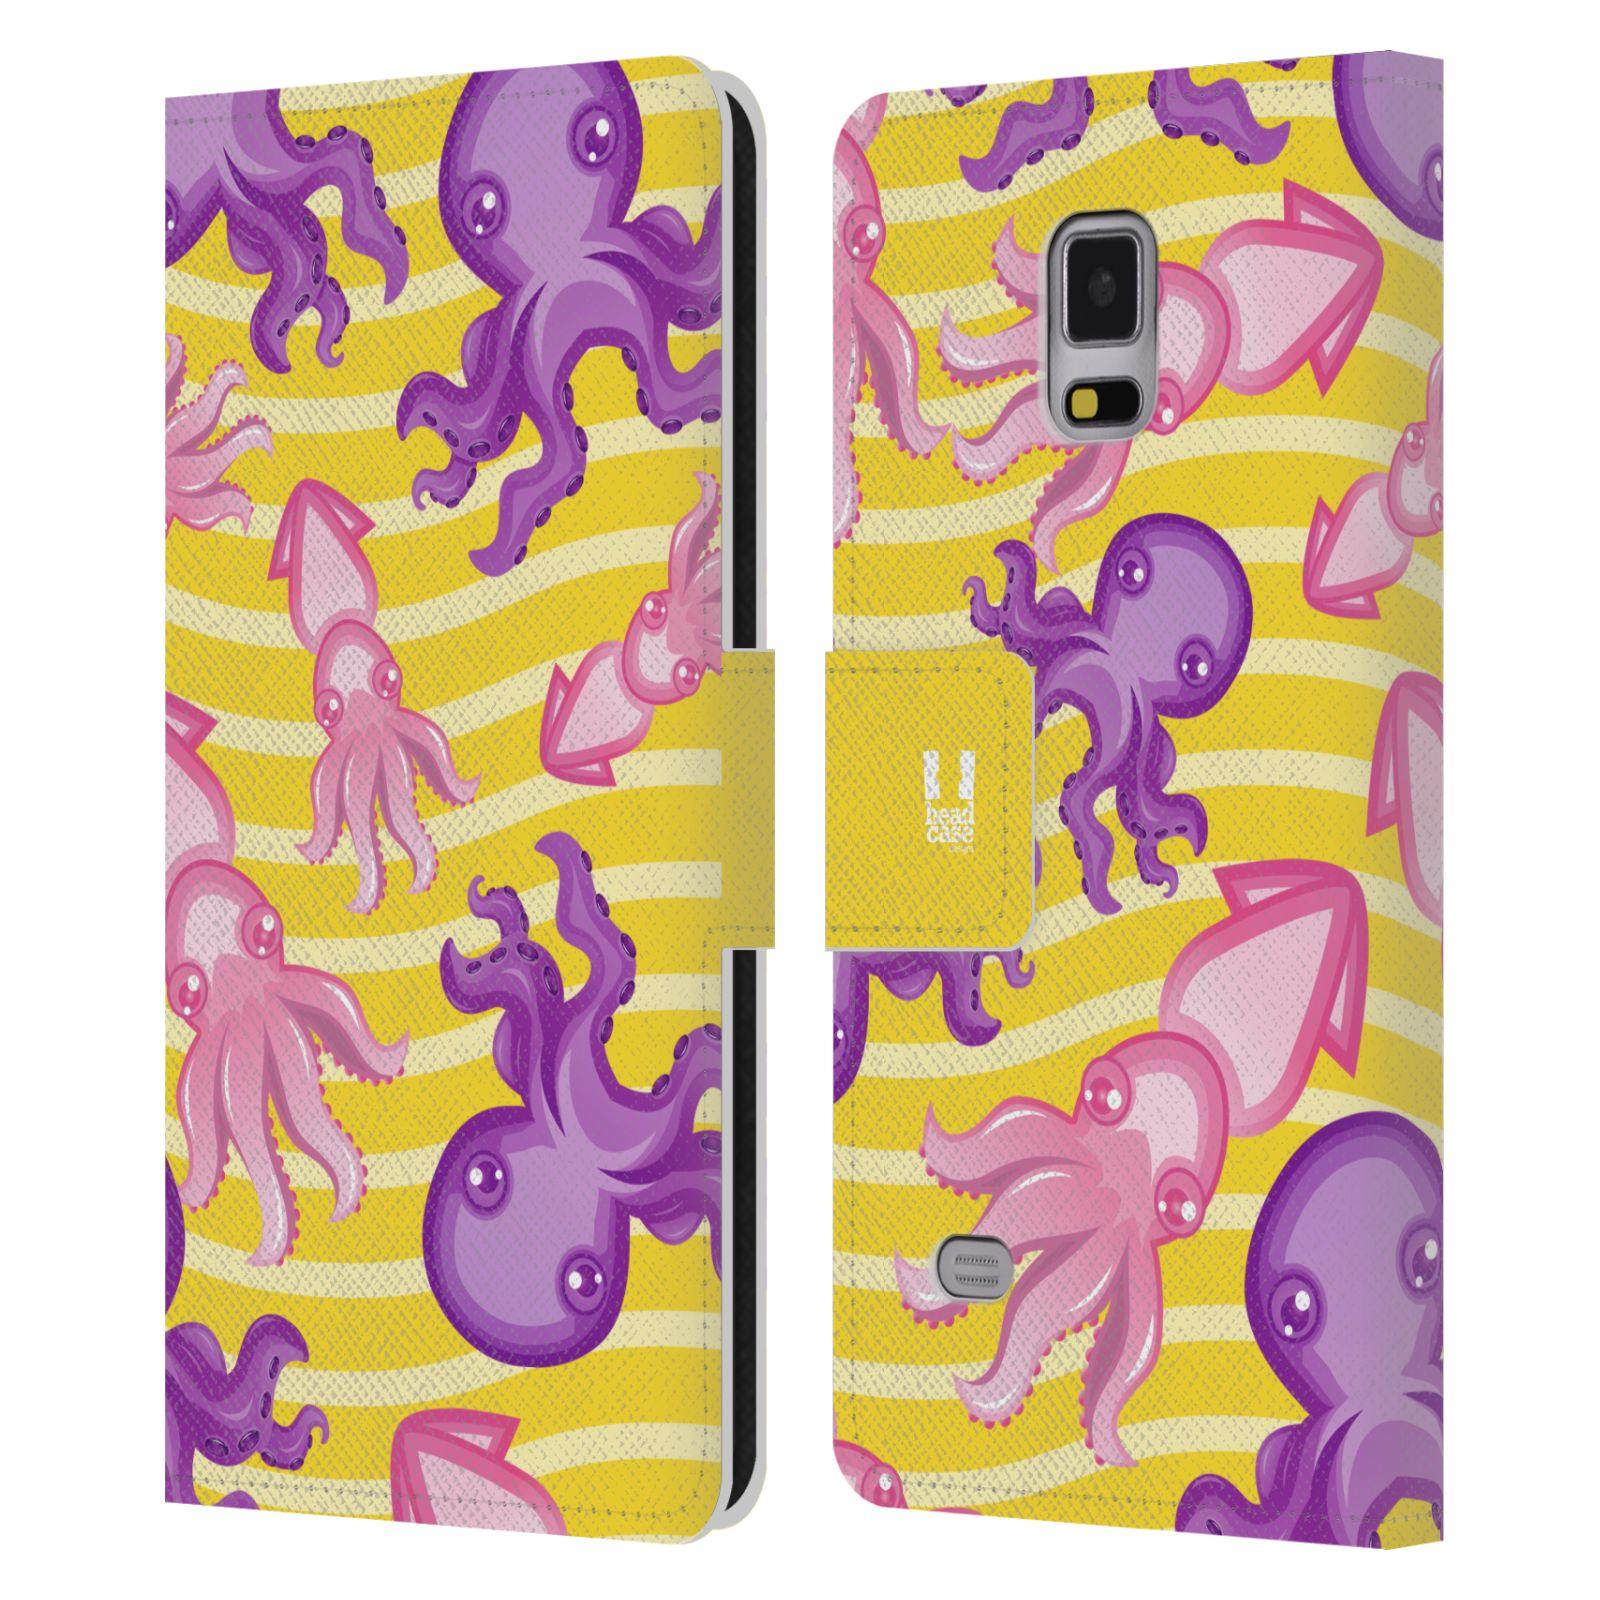 HEAD CASE Flipové pouzdro pro mobil Samsung Galaxy Note 4 Mořský živočich chobotnice a krakatice žlutá barva